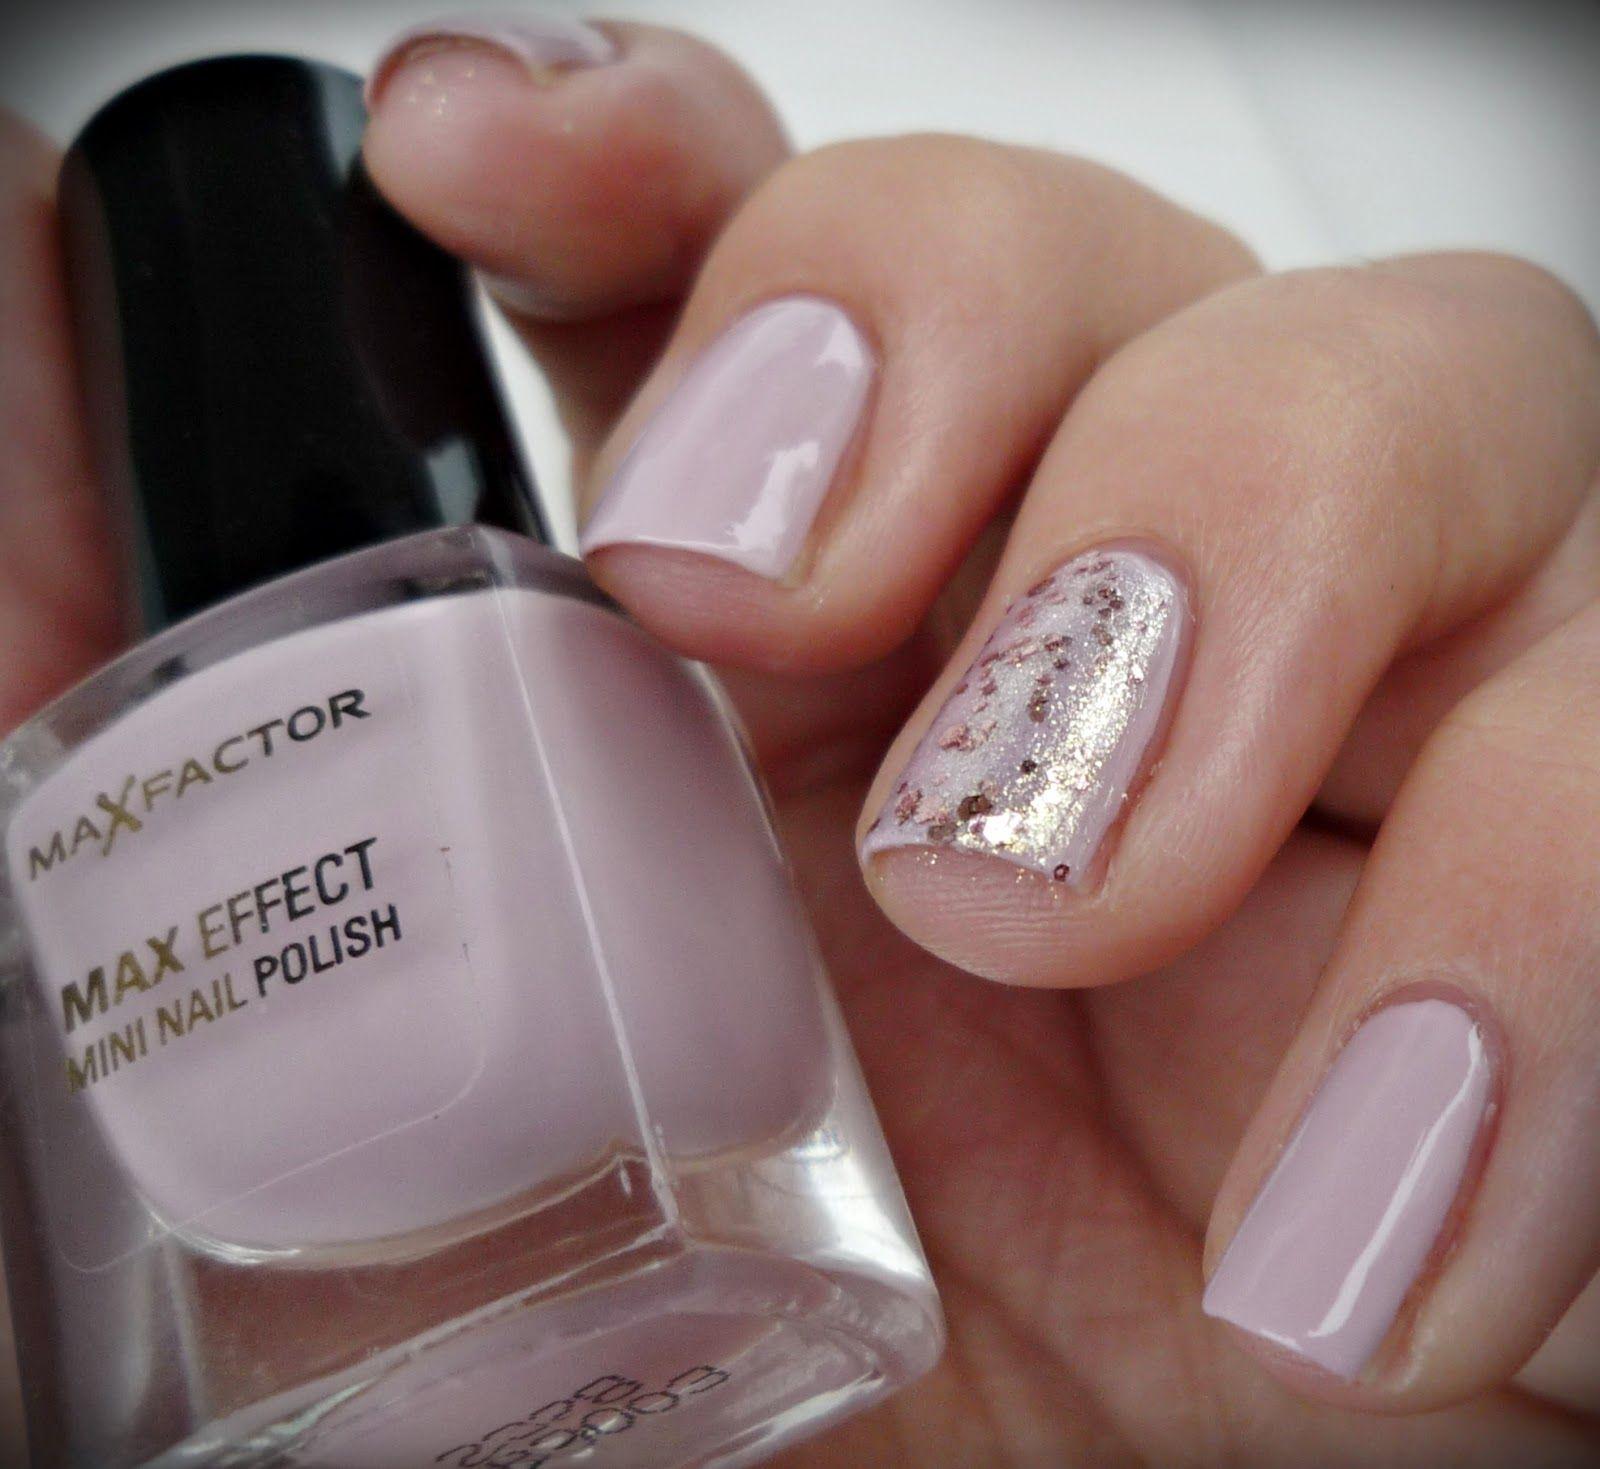 Max Factor Max Effect Mini Nail Polish 30 Chilled Lilac Maybelline Brocades C 220 Aneb Vazne Povedena Dvojka Nehet Maybelline Max Factor